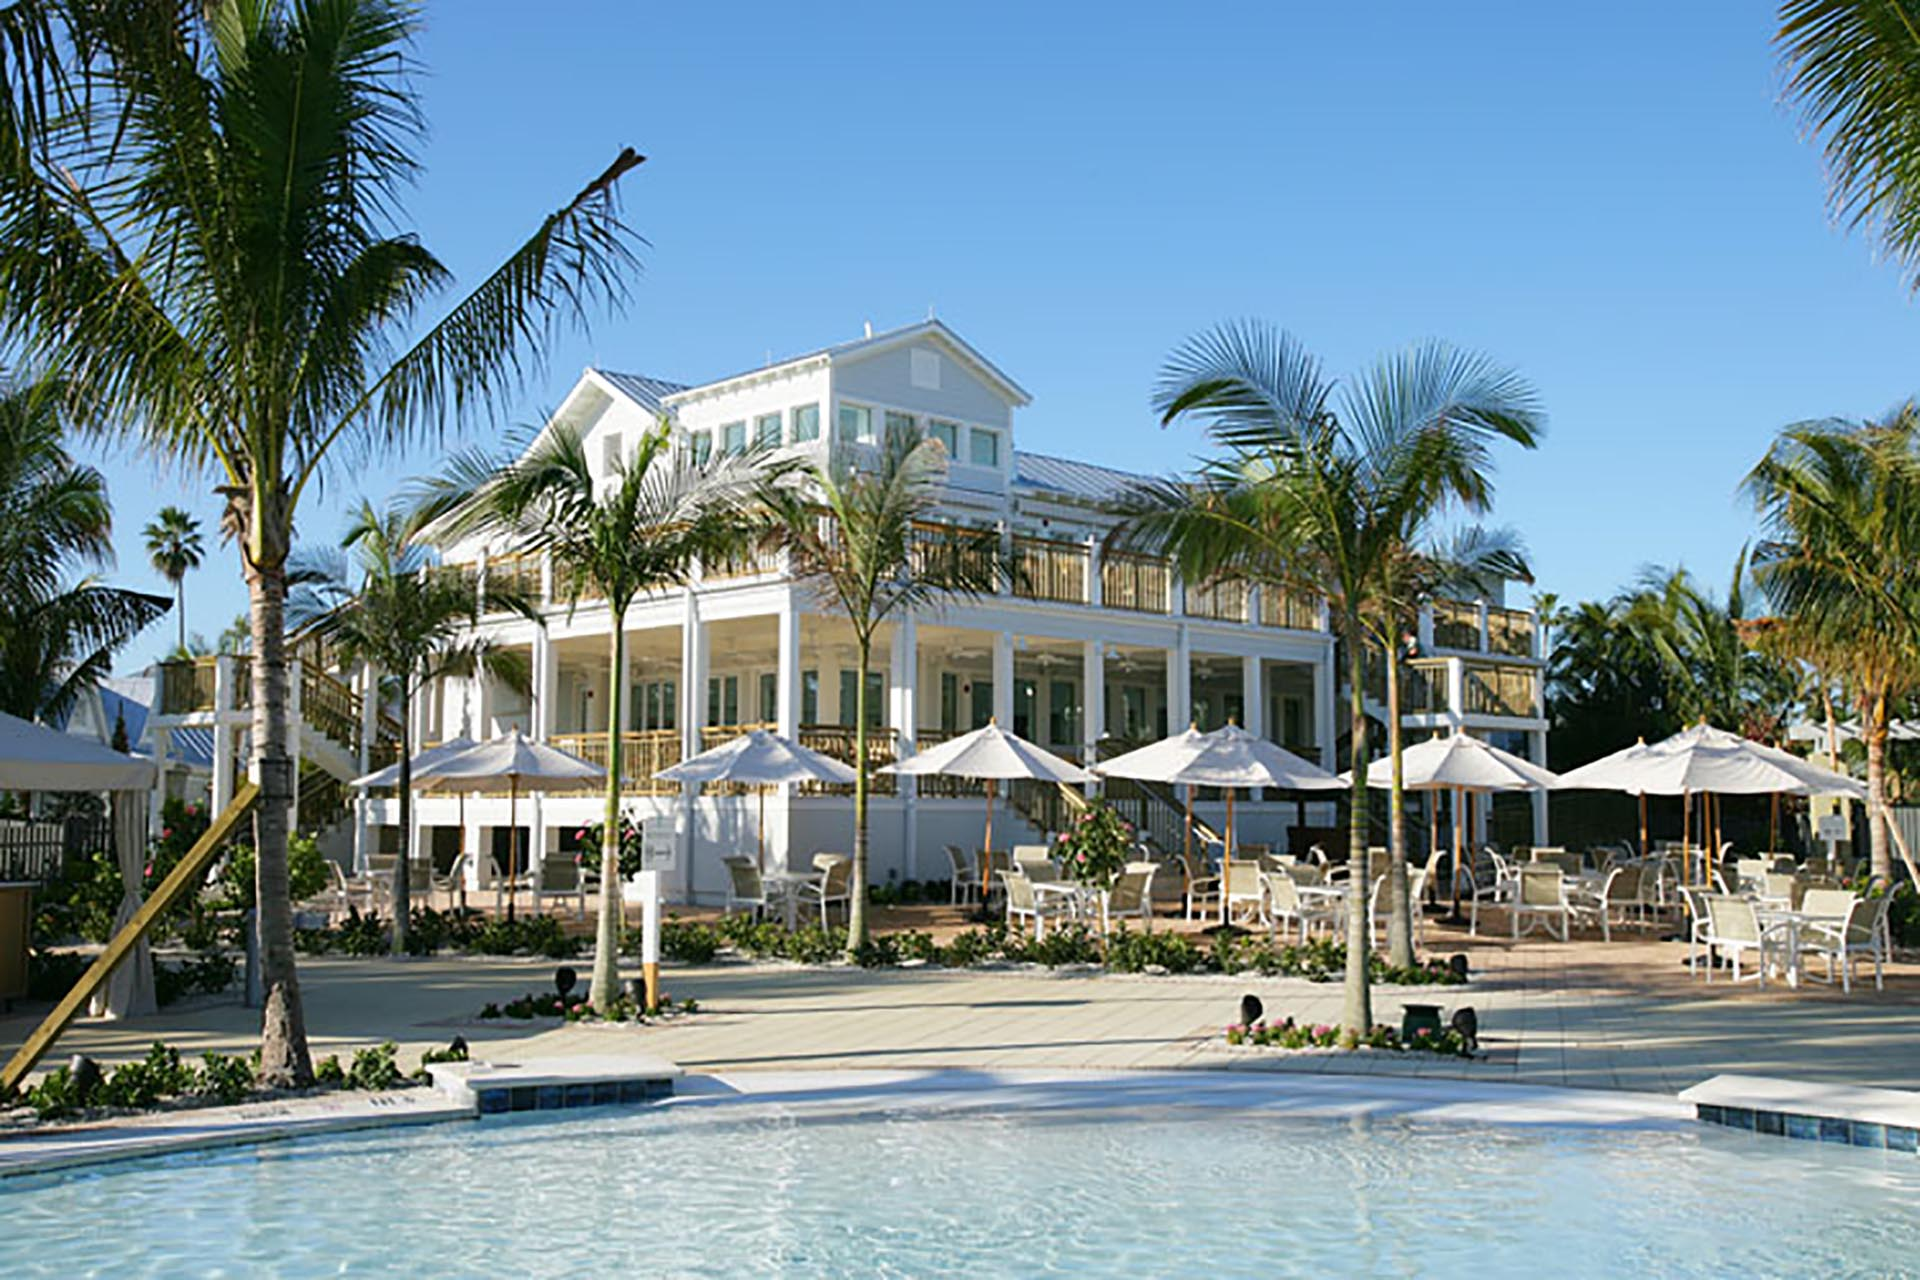 South Seas Island Resort Hurricane Damage